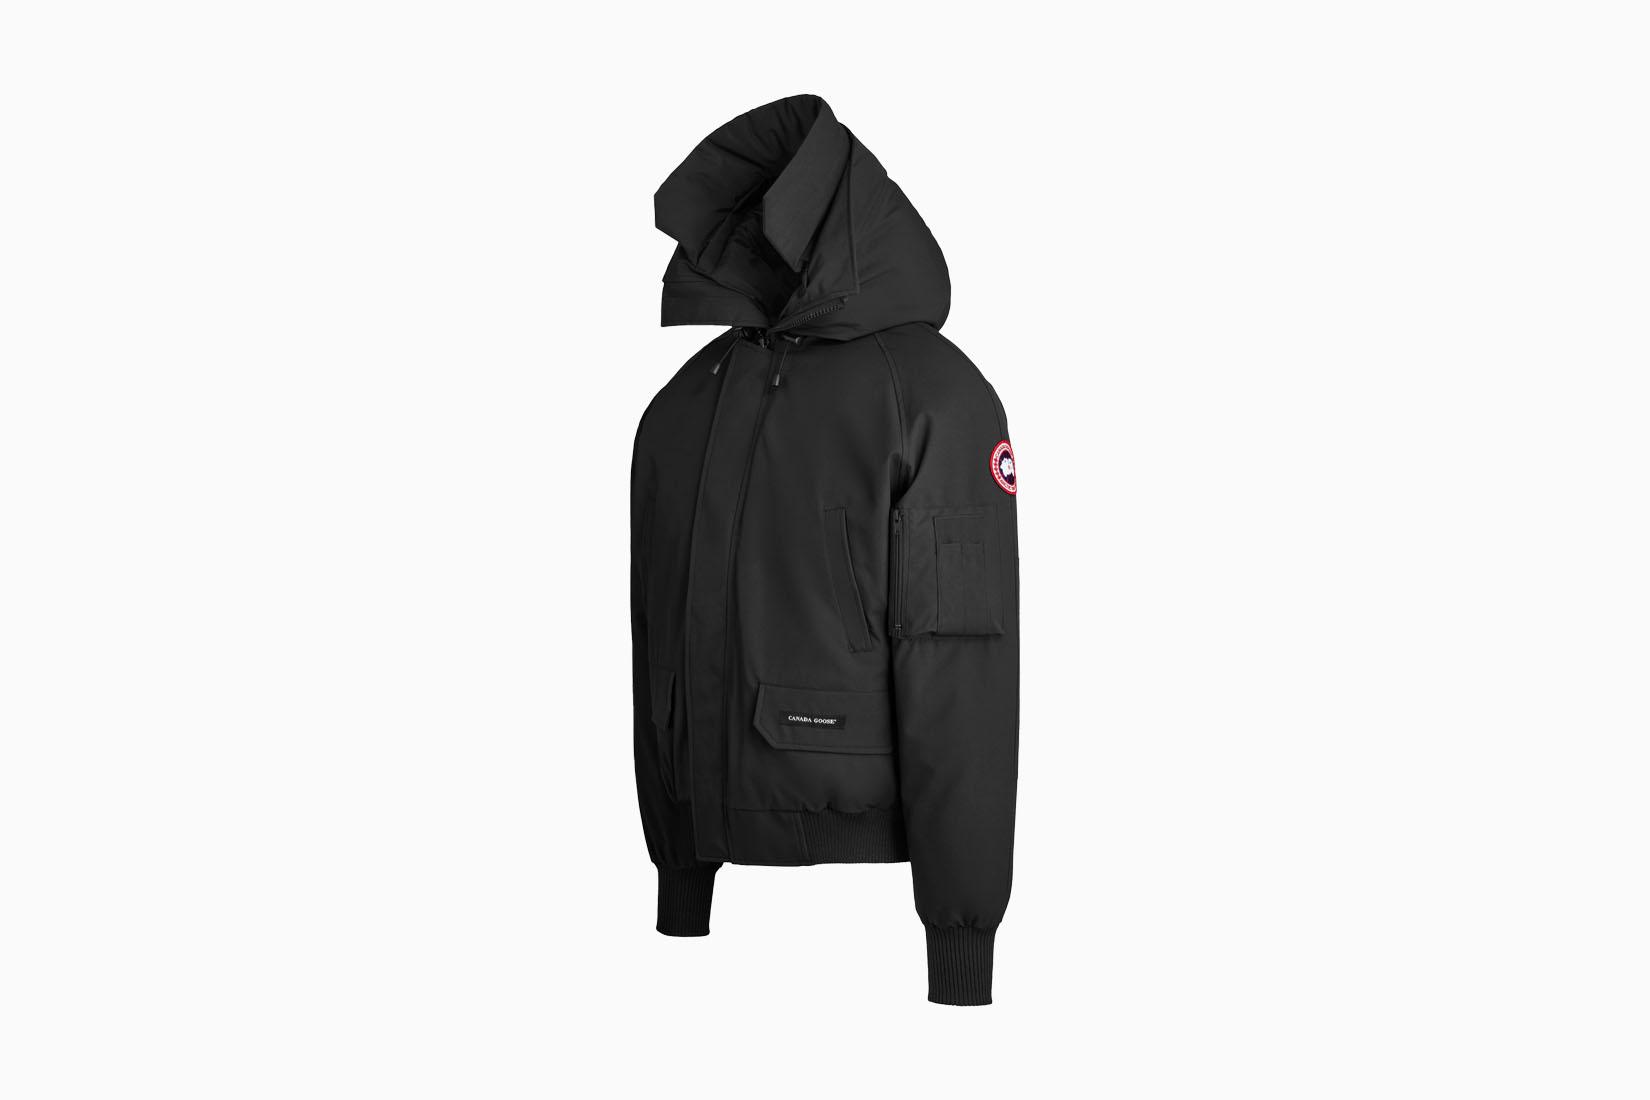 best men field jackets canada goose chilliwack review Luxe Digital